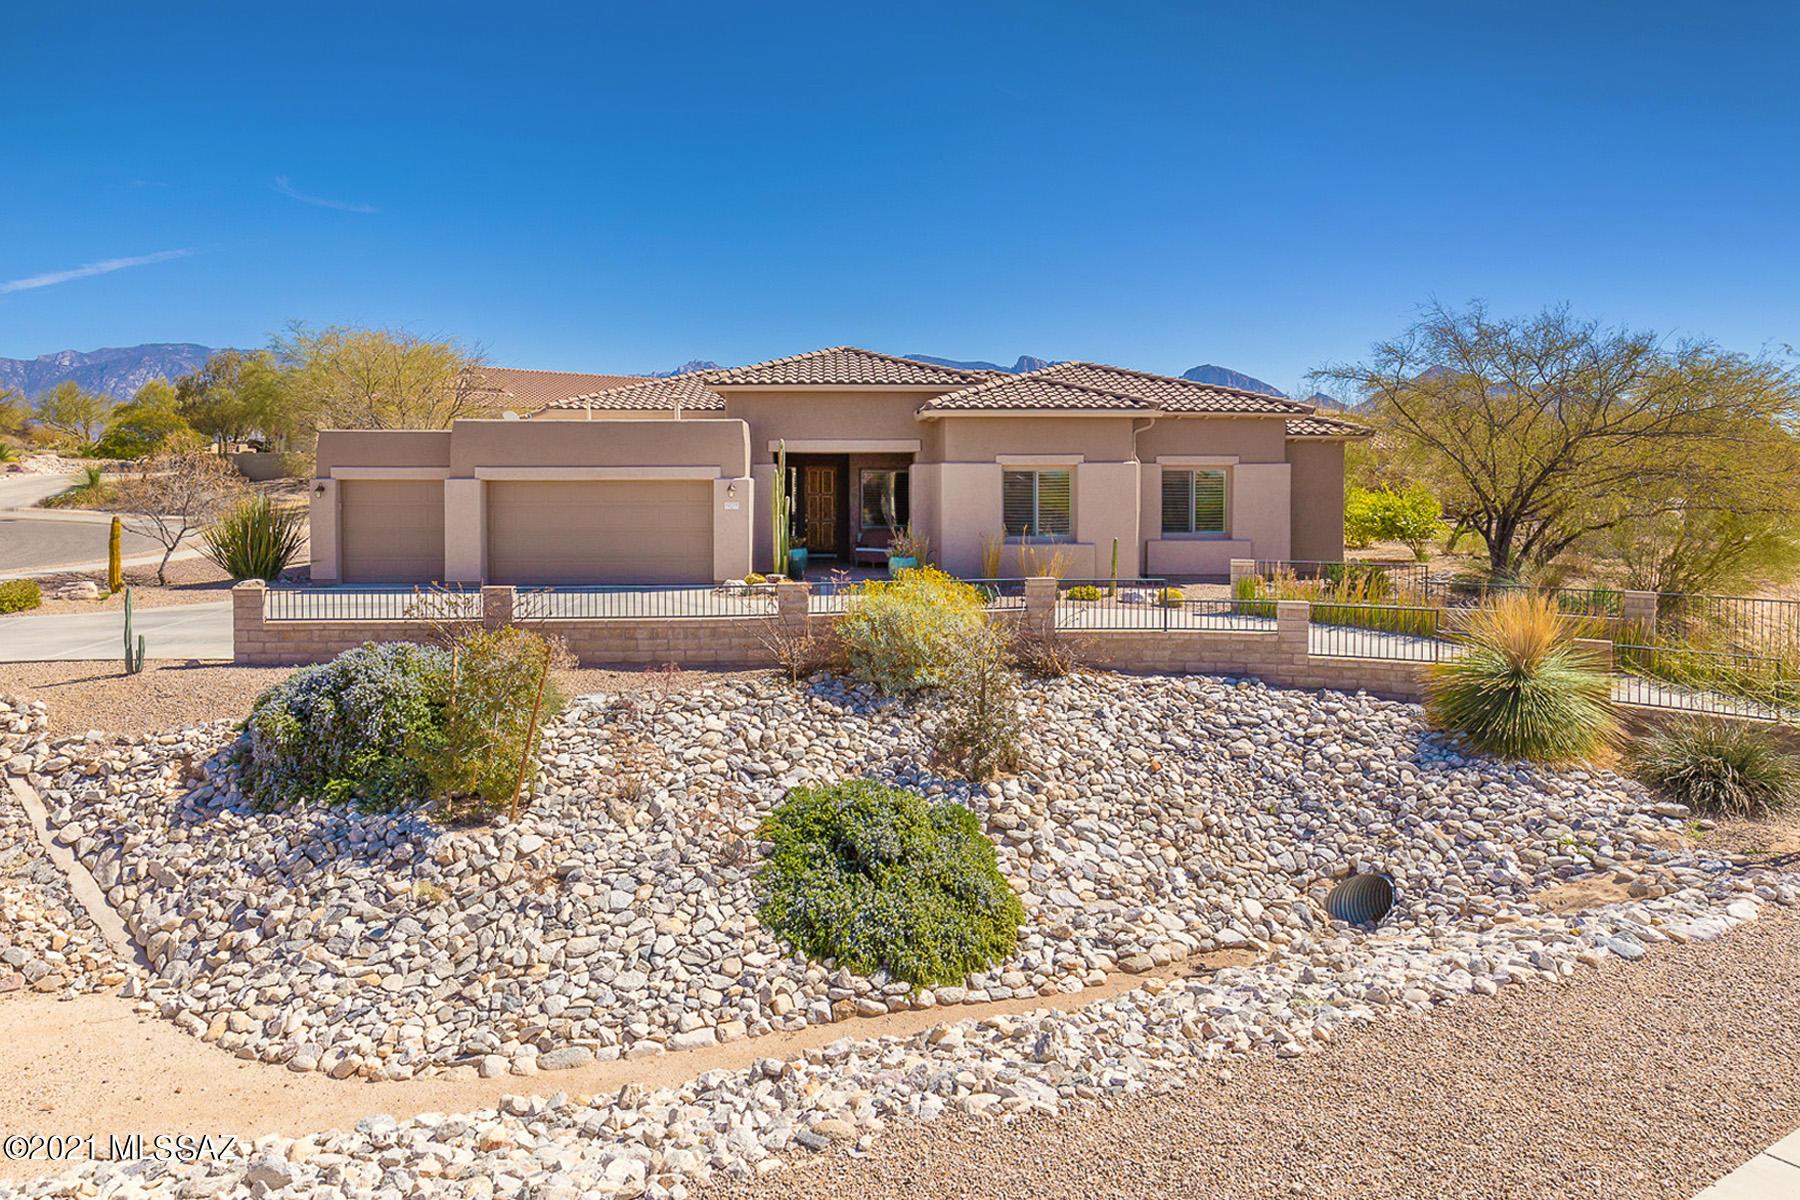 Photo of 12770 N Yellow Bird Road, Oro Valley, AZ 85755